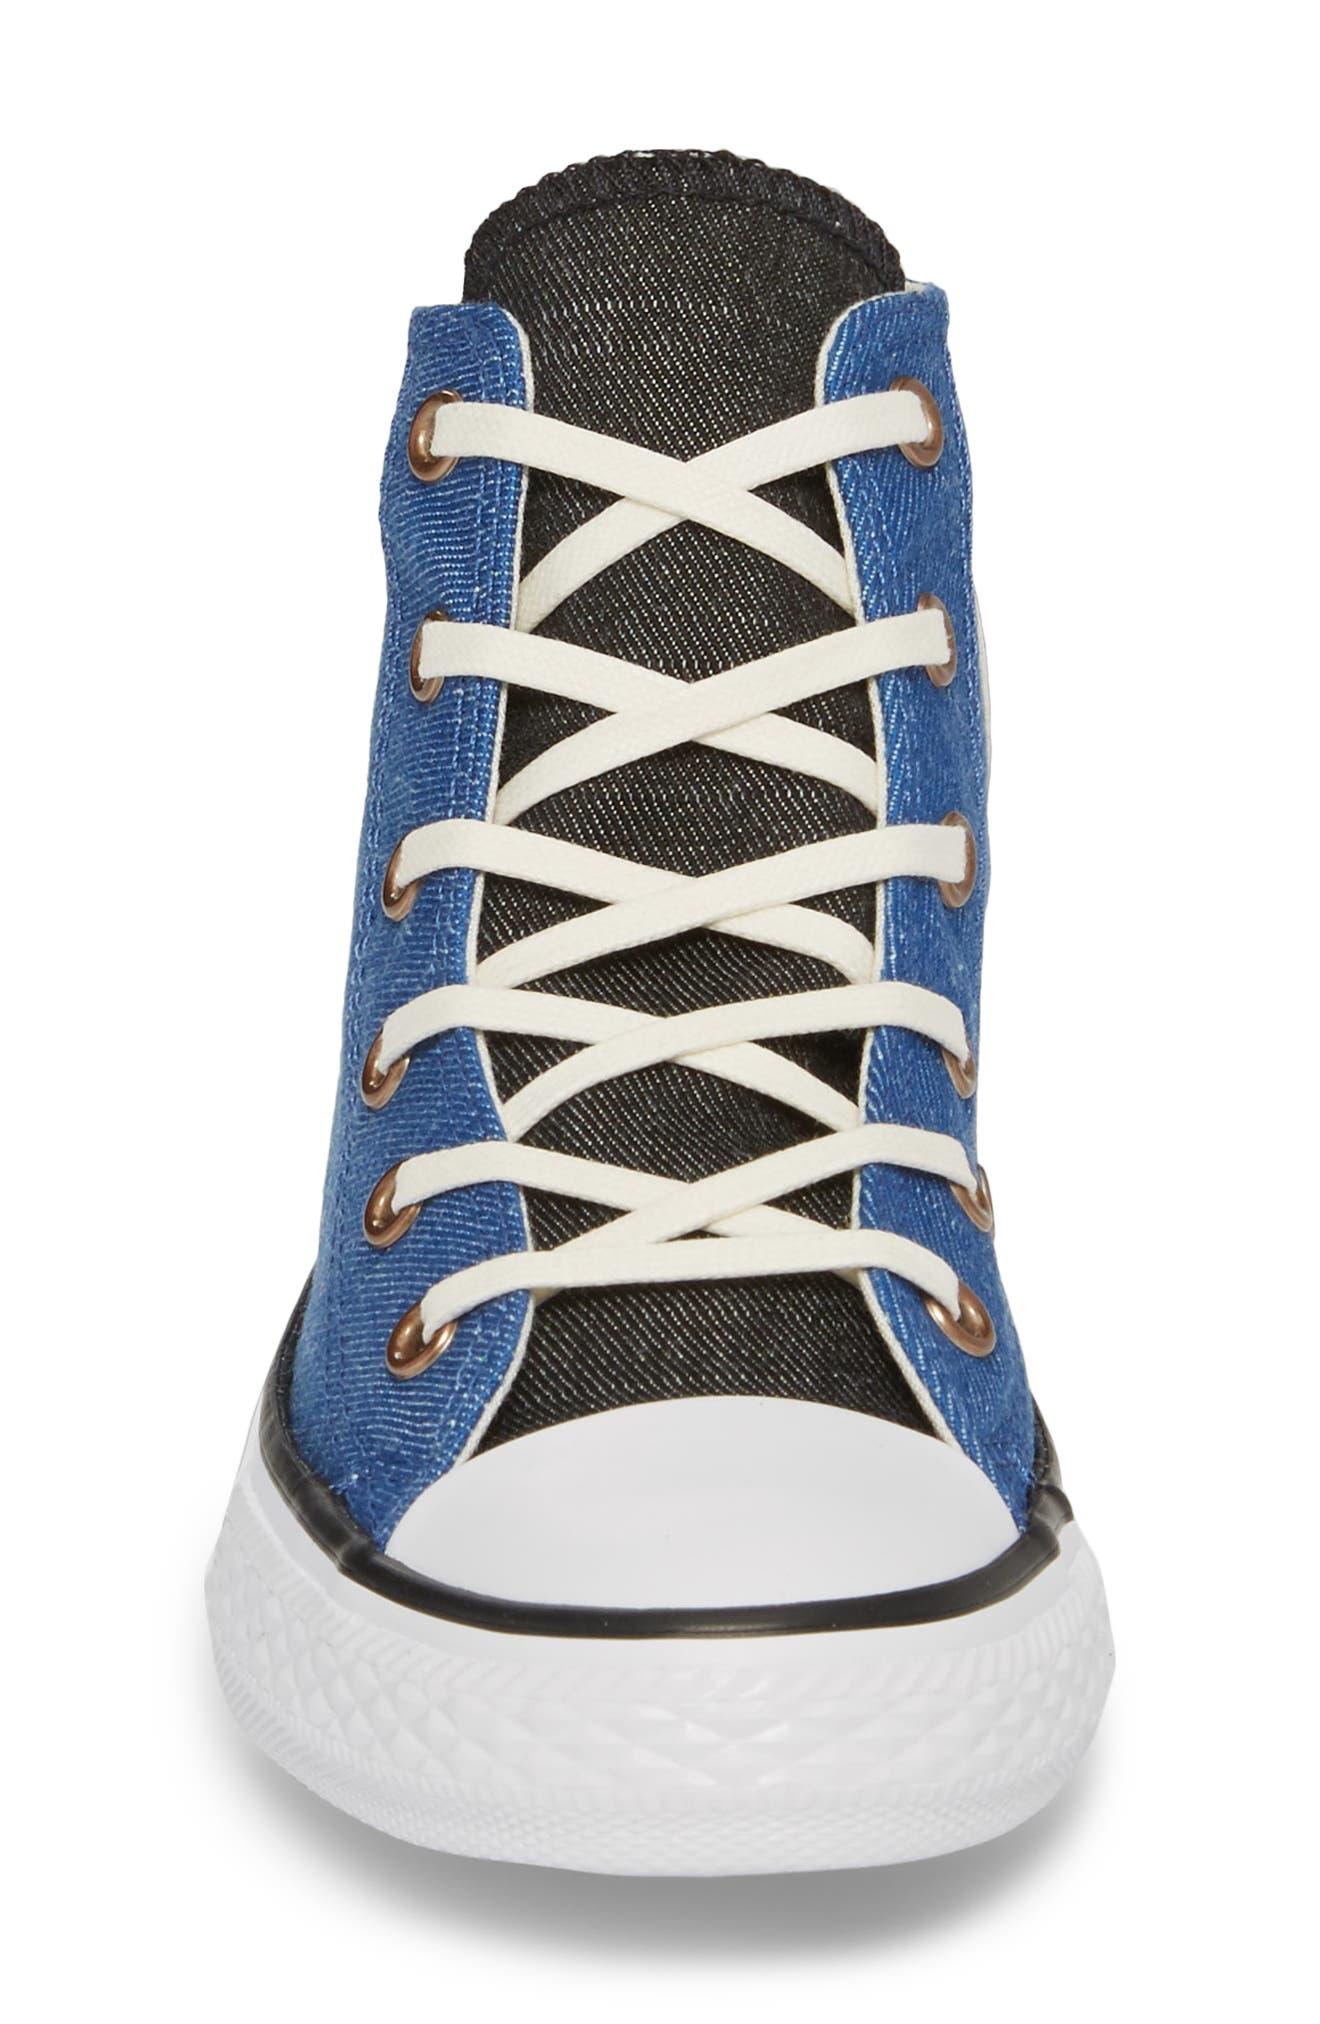 Chuck Taylor<sup>®</sup> All Star<sup>®</sup> Chambray High Top Sneaker,                             Alternate thumbnail 4, color,                             Nightfall Blue